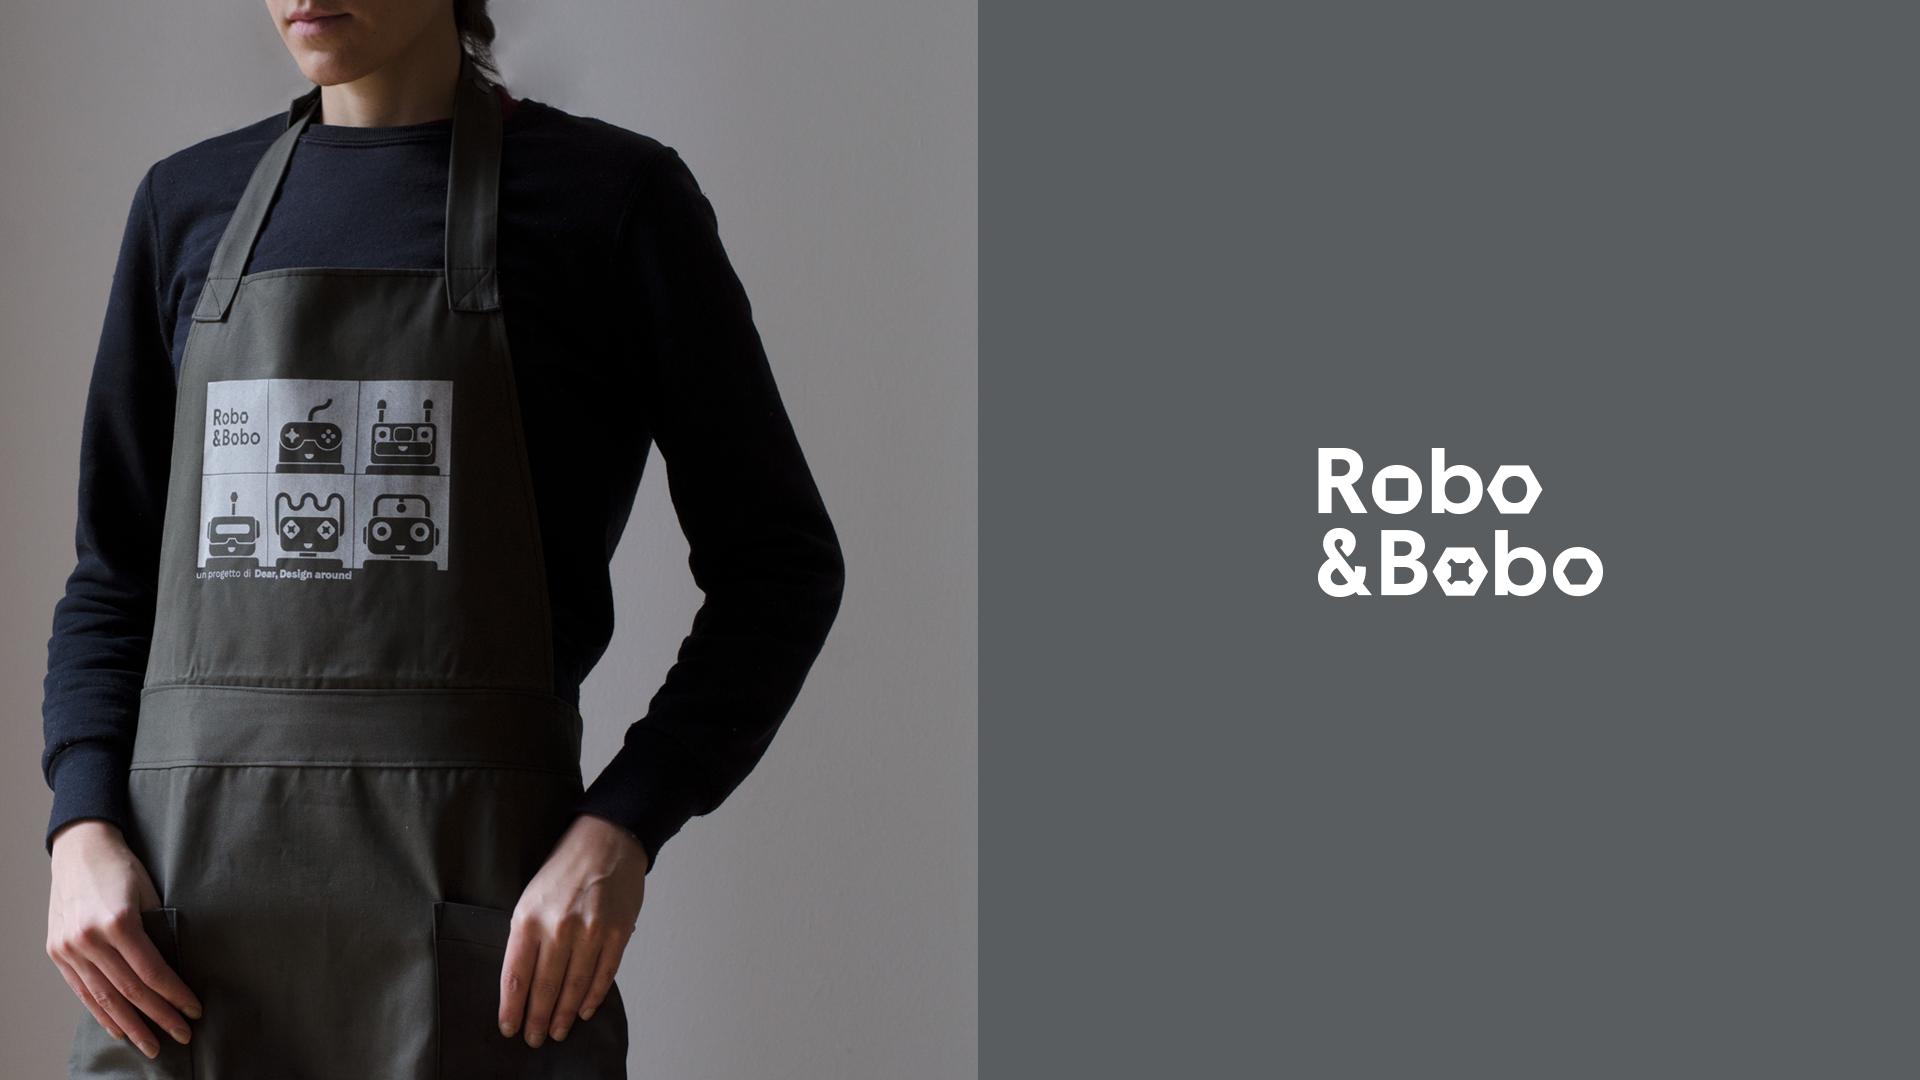 Robo & Bobo branding by Isabela Freire